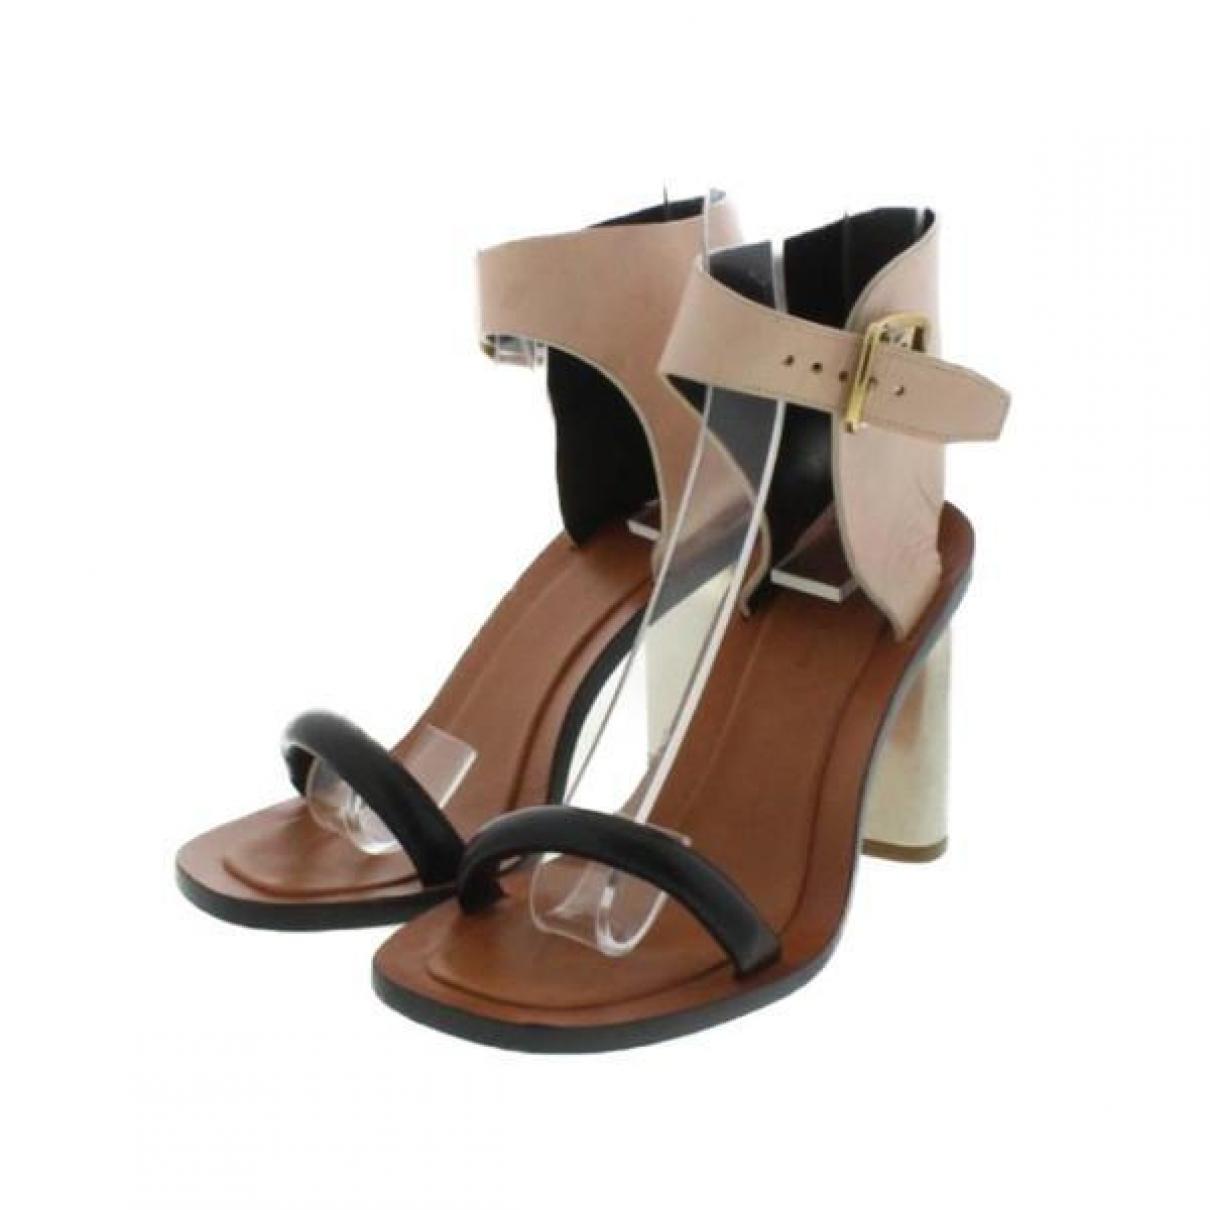 Celine \N Sandalen in  Beige Leder